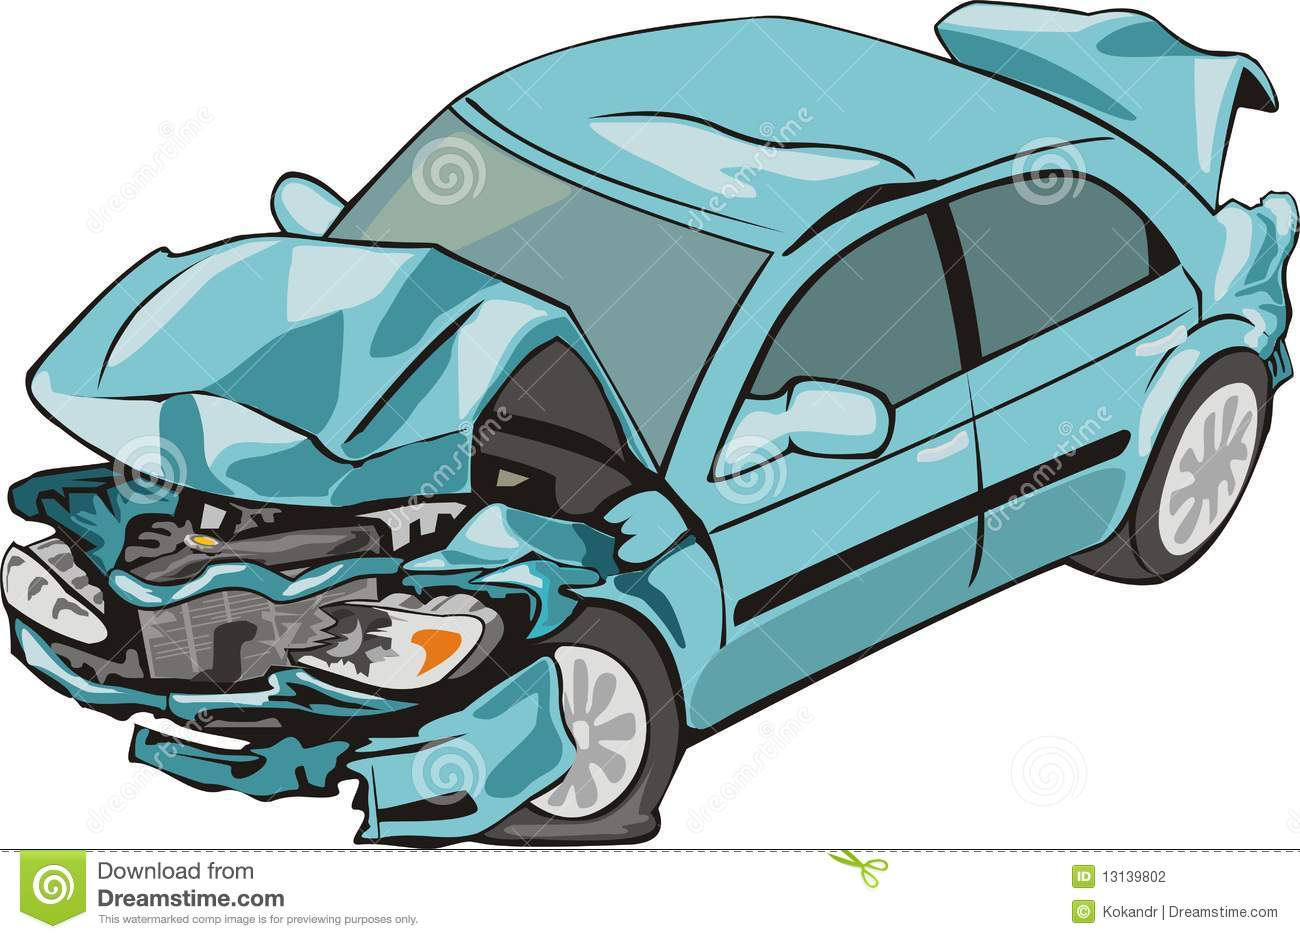 68 Simple How To Draw Cartoon Car Crash.